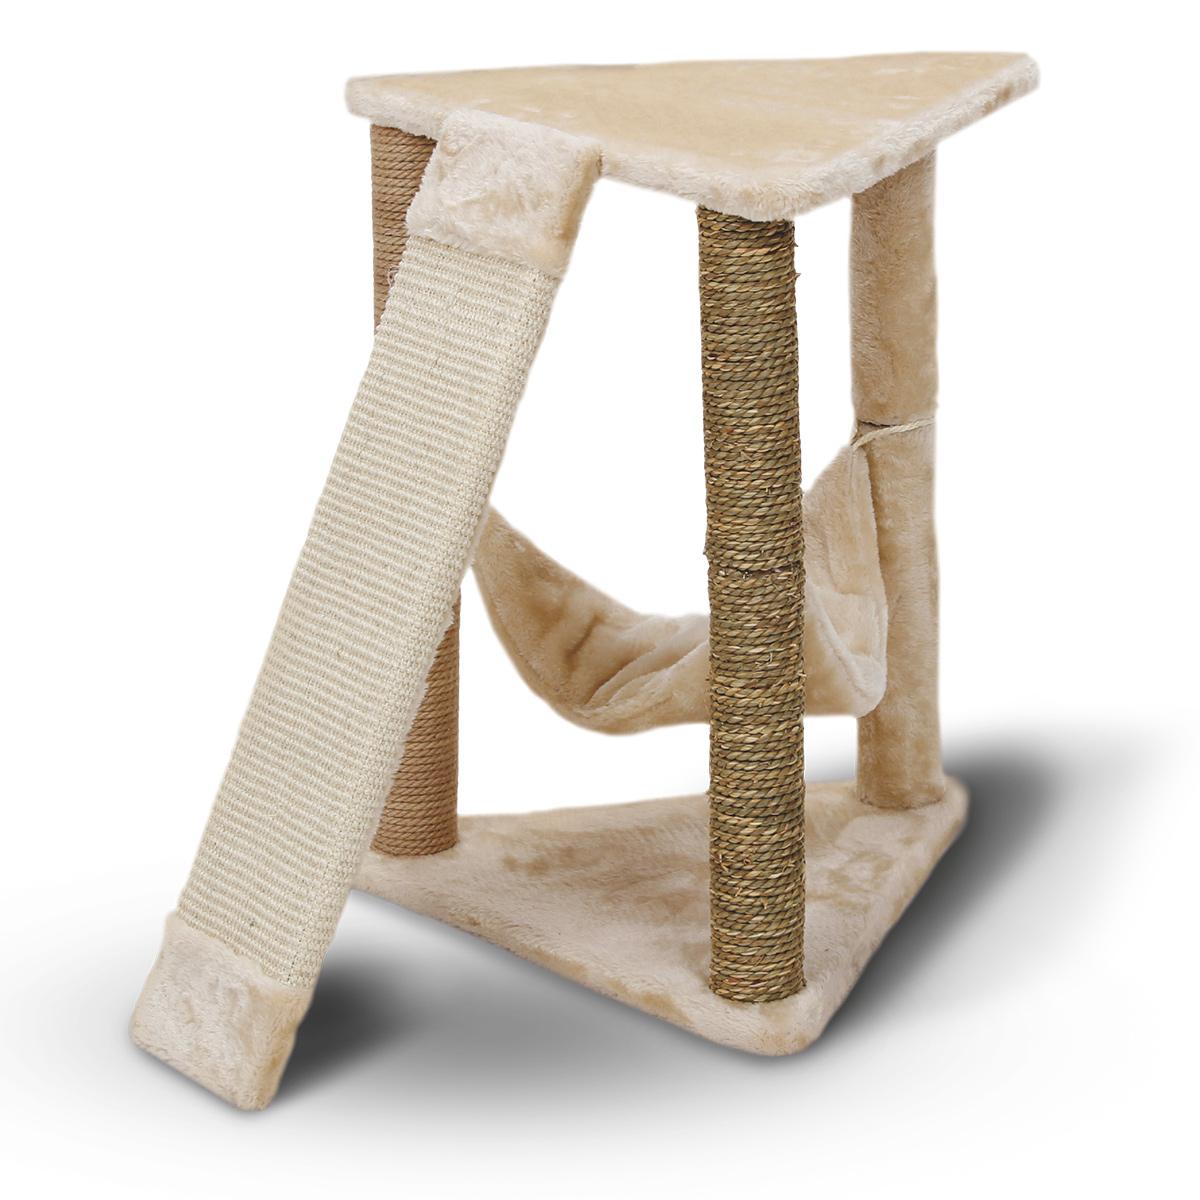 zooroyal kratzbaum lene 58cm beige g nstig kaufen bei zooroyal. Black Bedroom Furniture Sets. Home Design Ideas